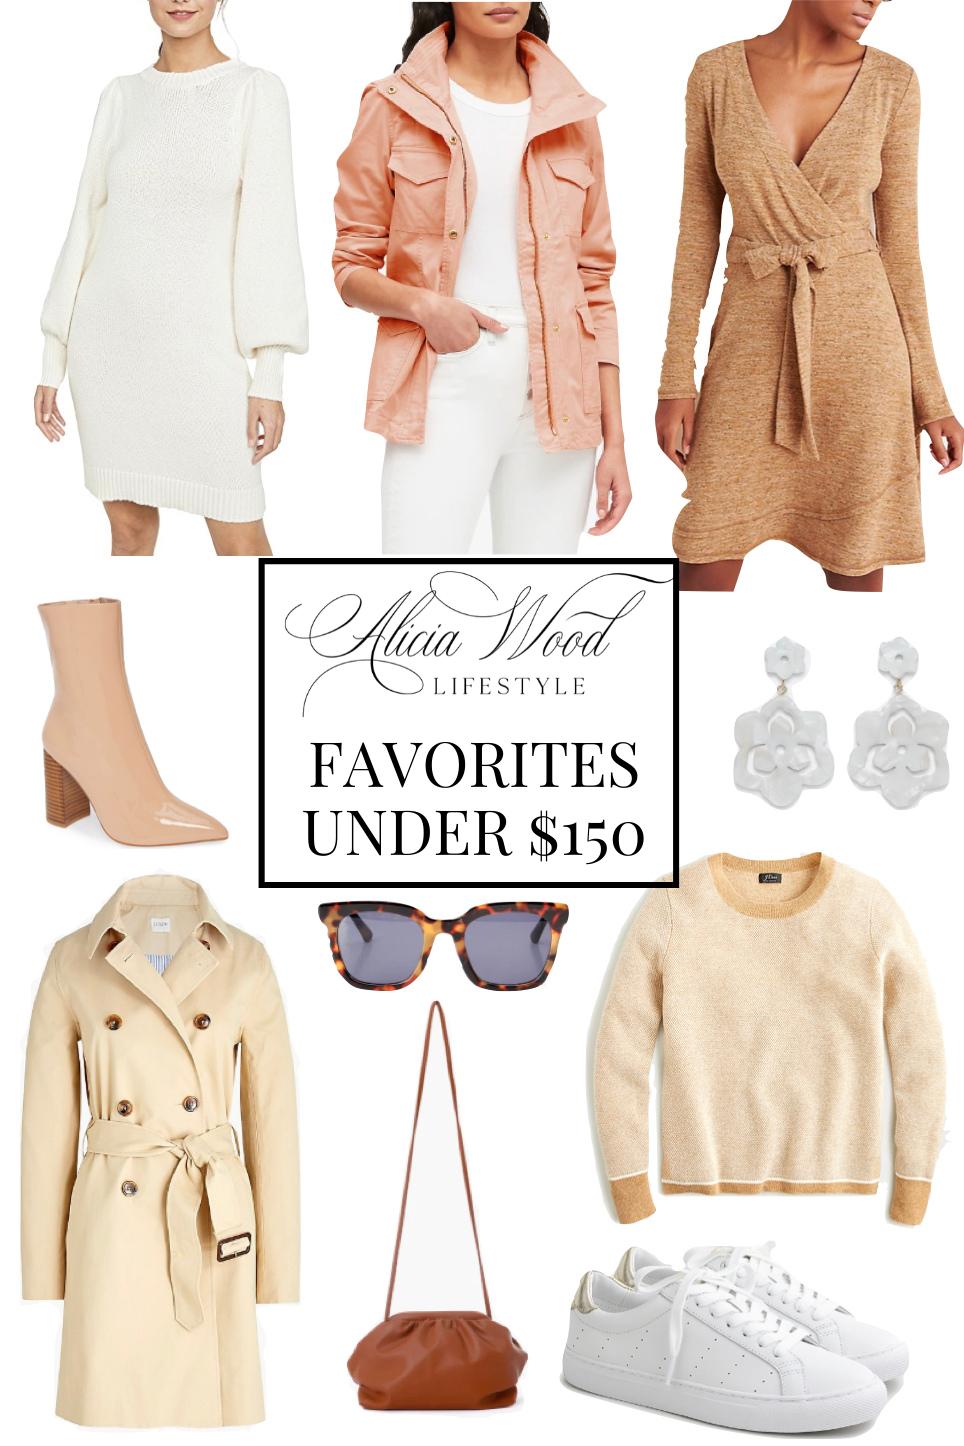 February Favorites Under $150